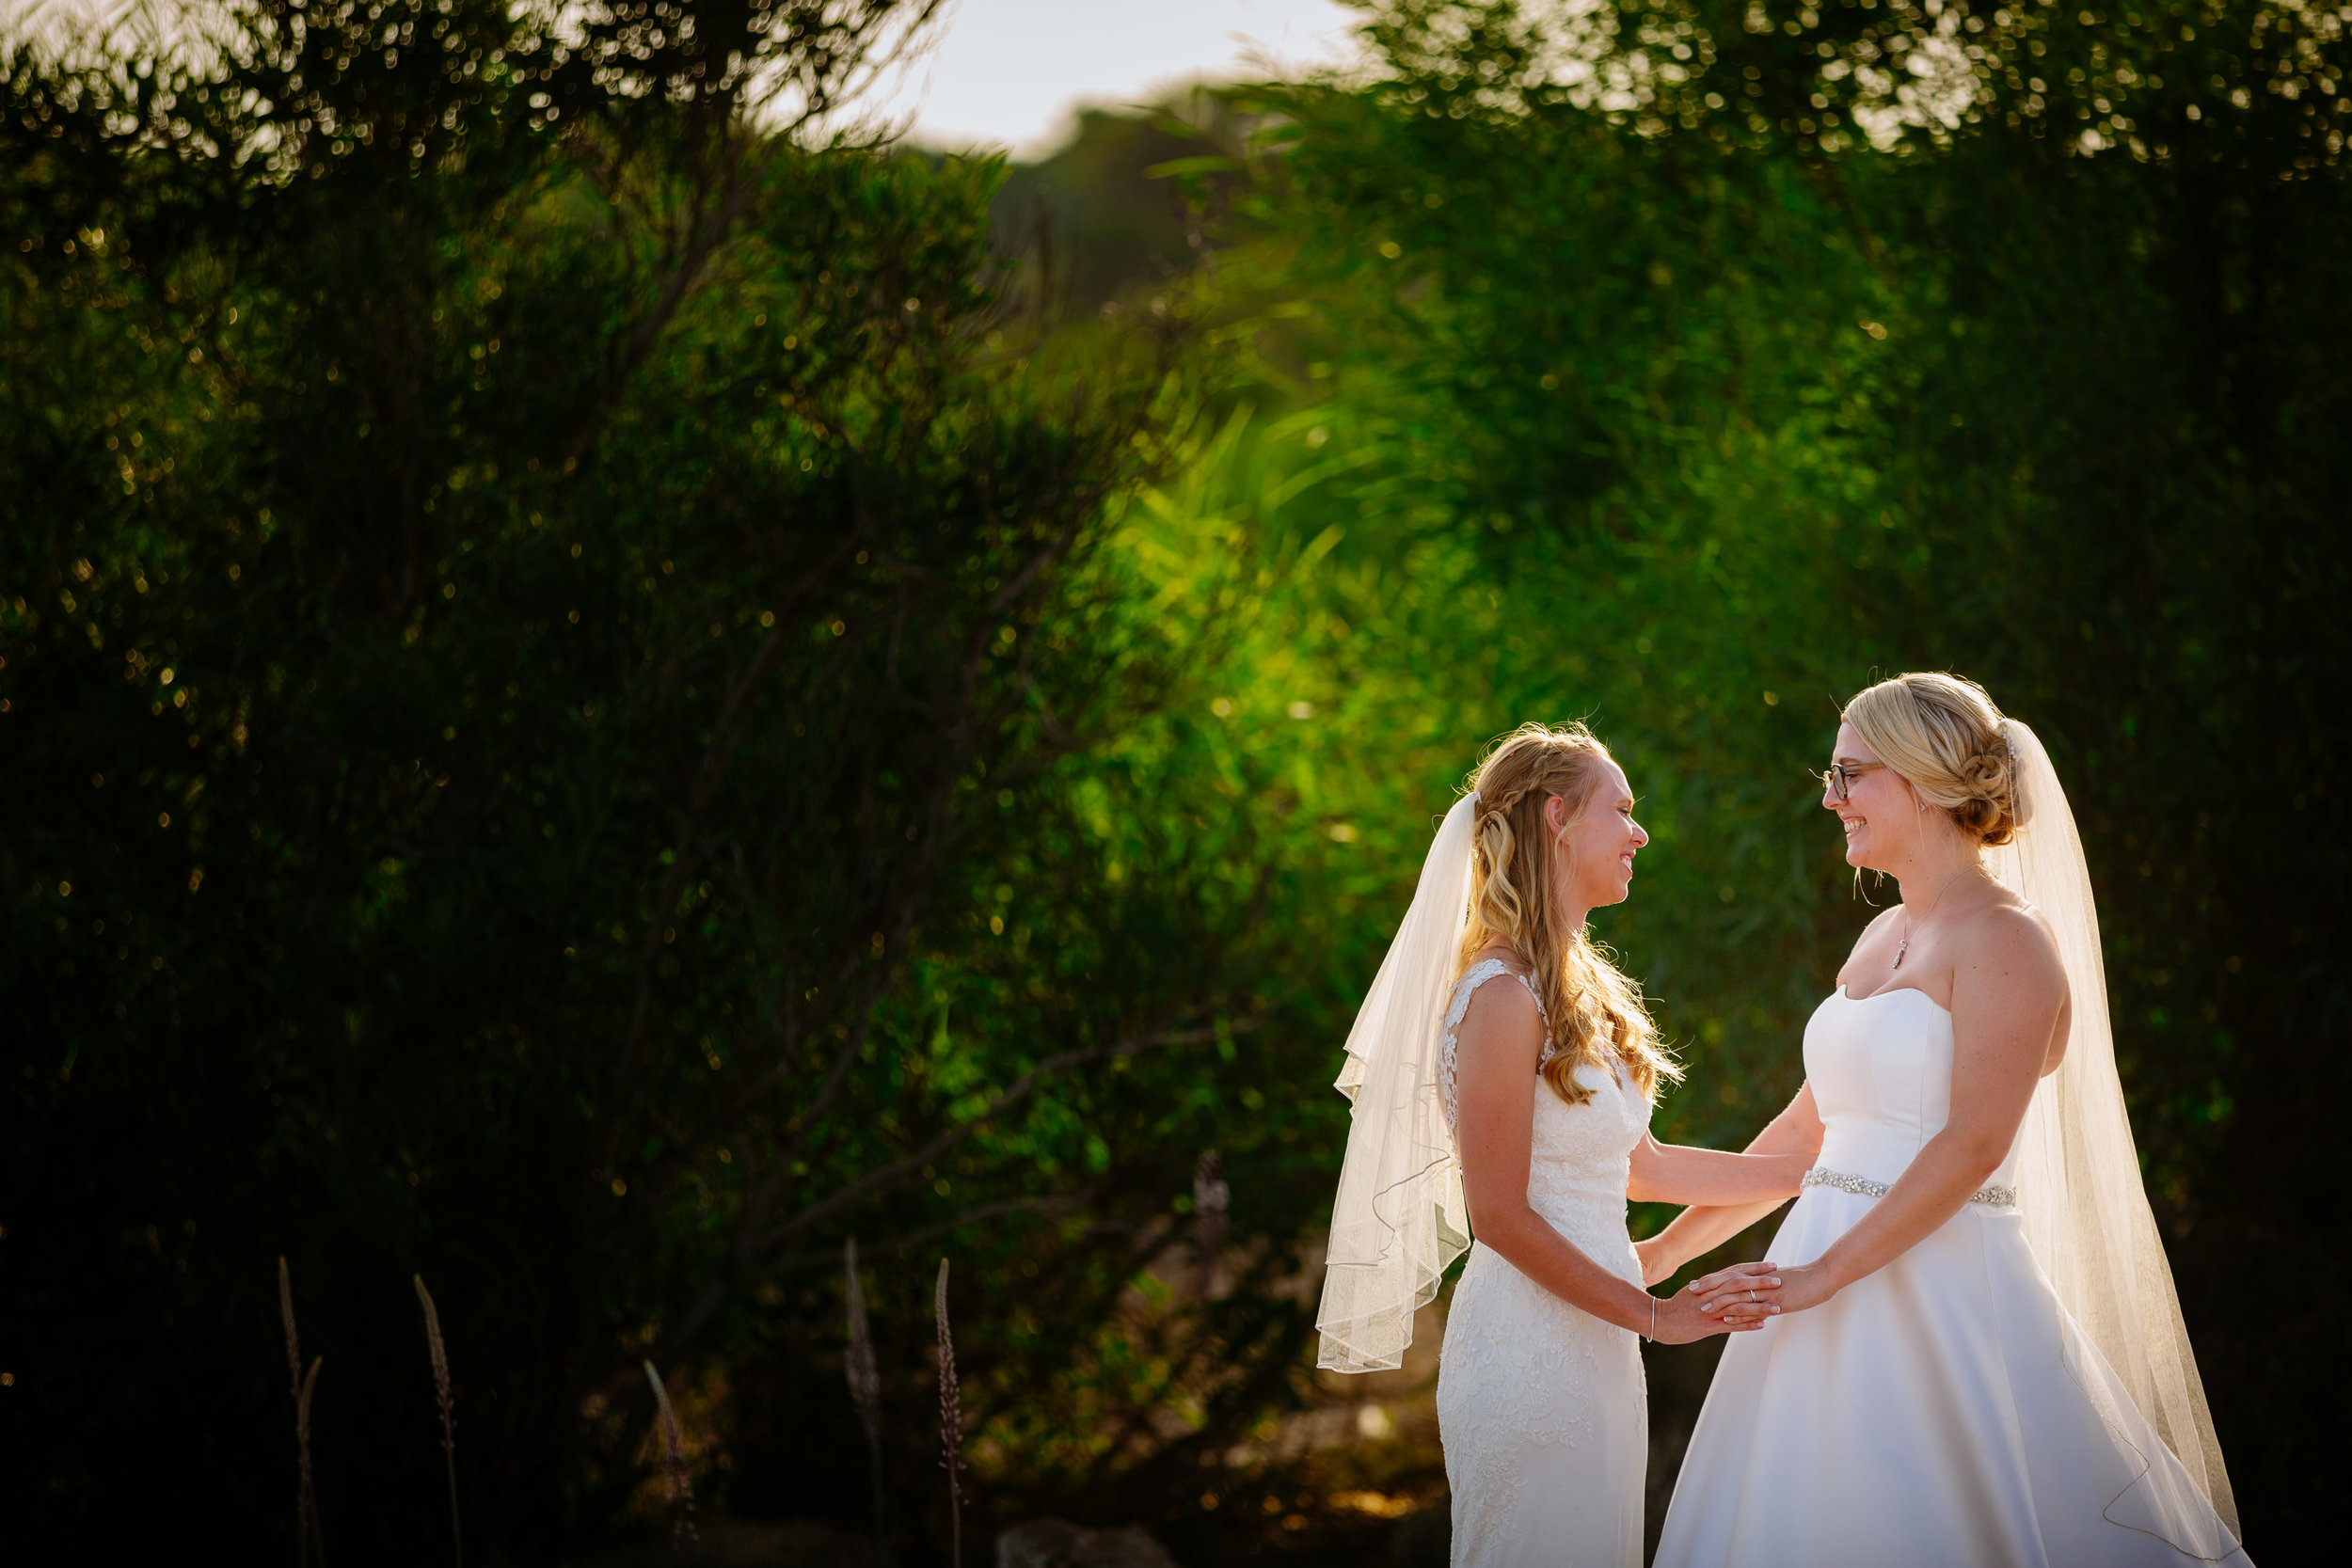 Malta_wedding_photography-79.jpg